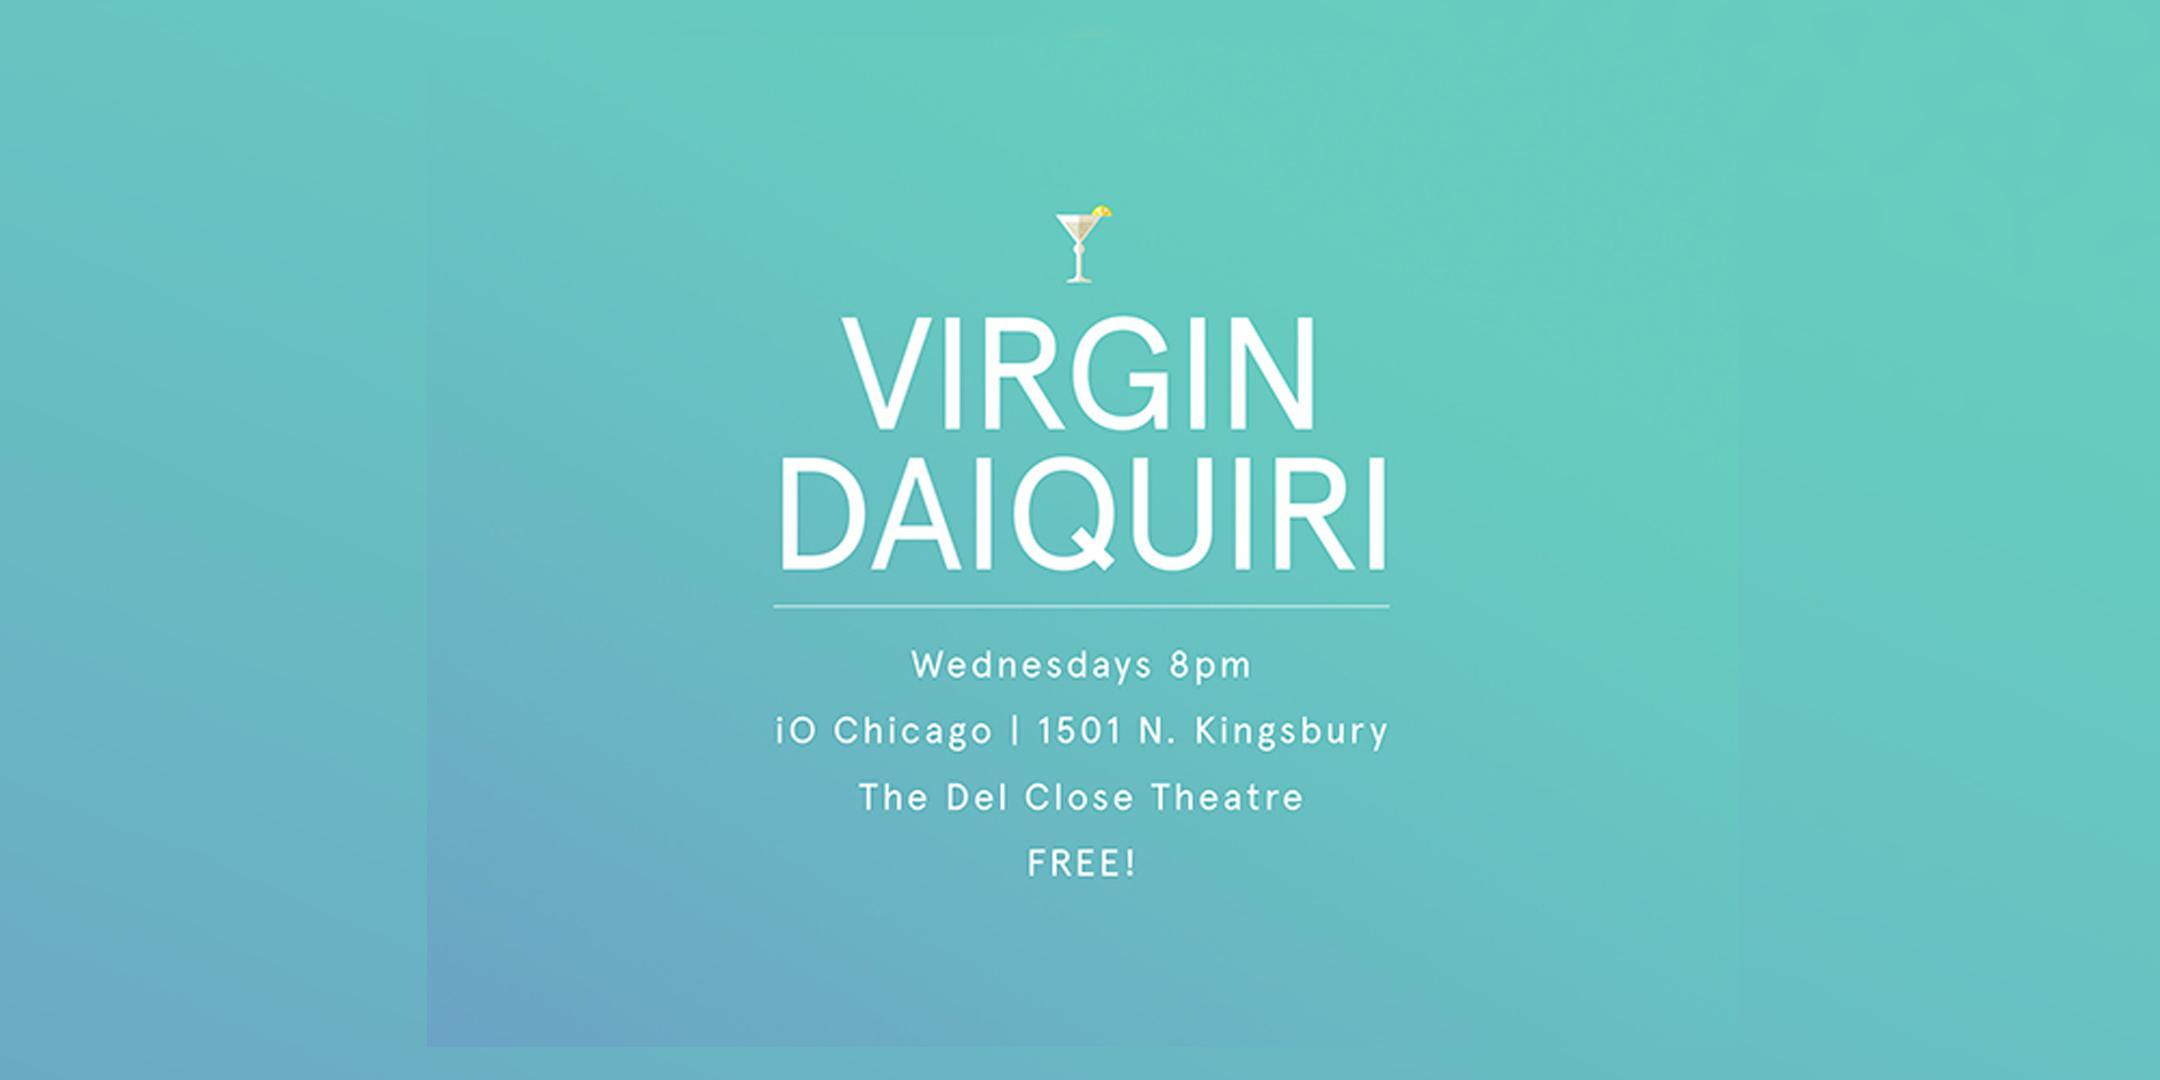 Virgin Daiquiri, The Harold Team State Schramps